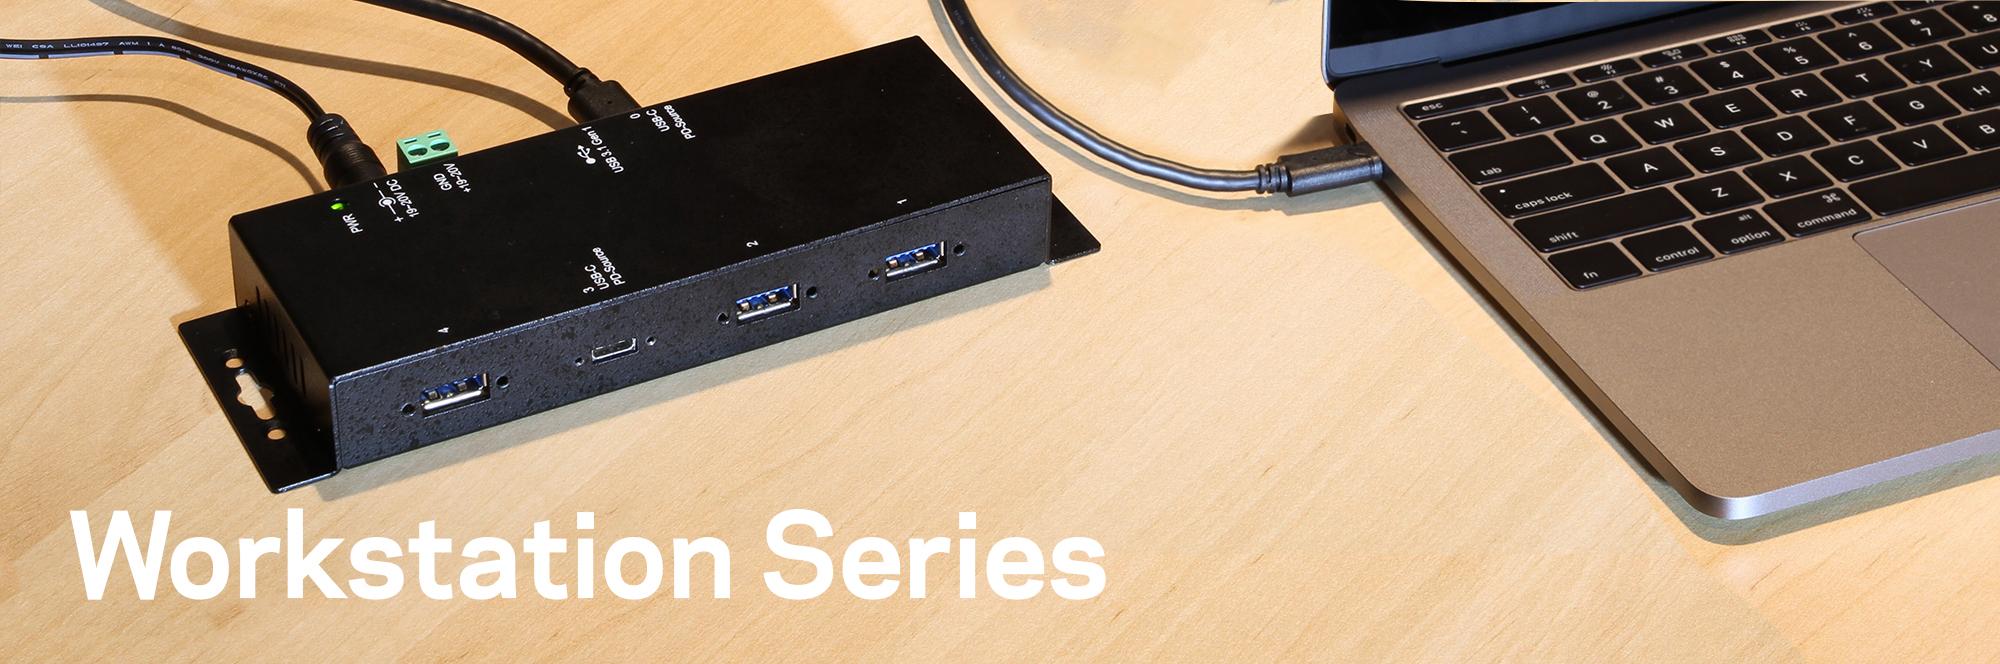 Metal 7-Port USB 2.0 Powered Slim Hub for PC-MAC with Power Adapter hub